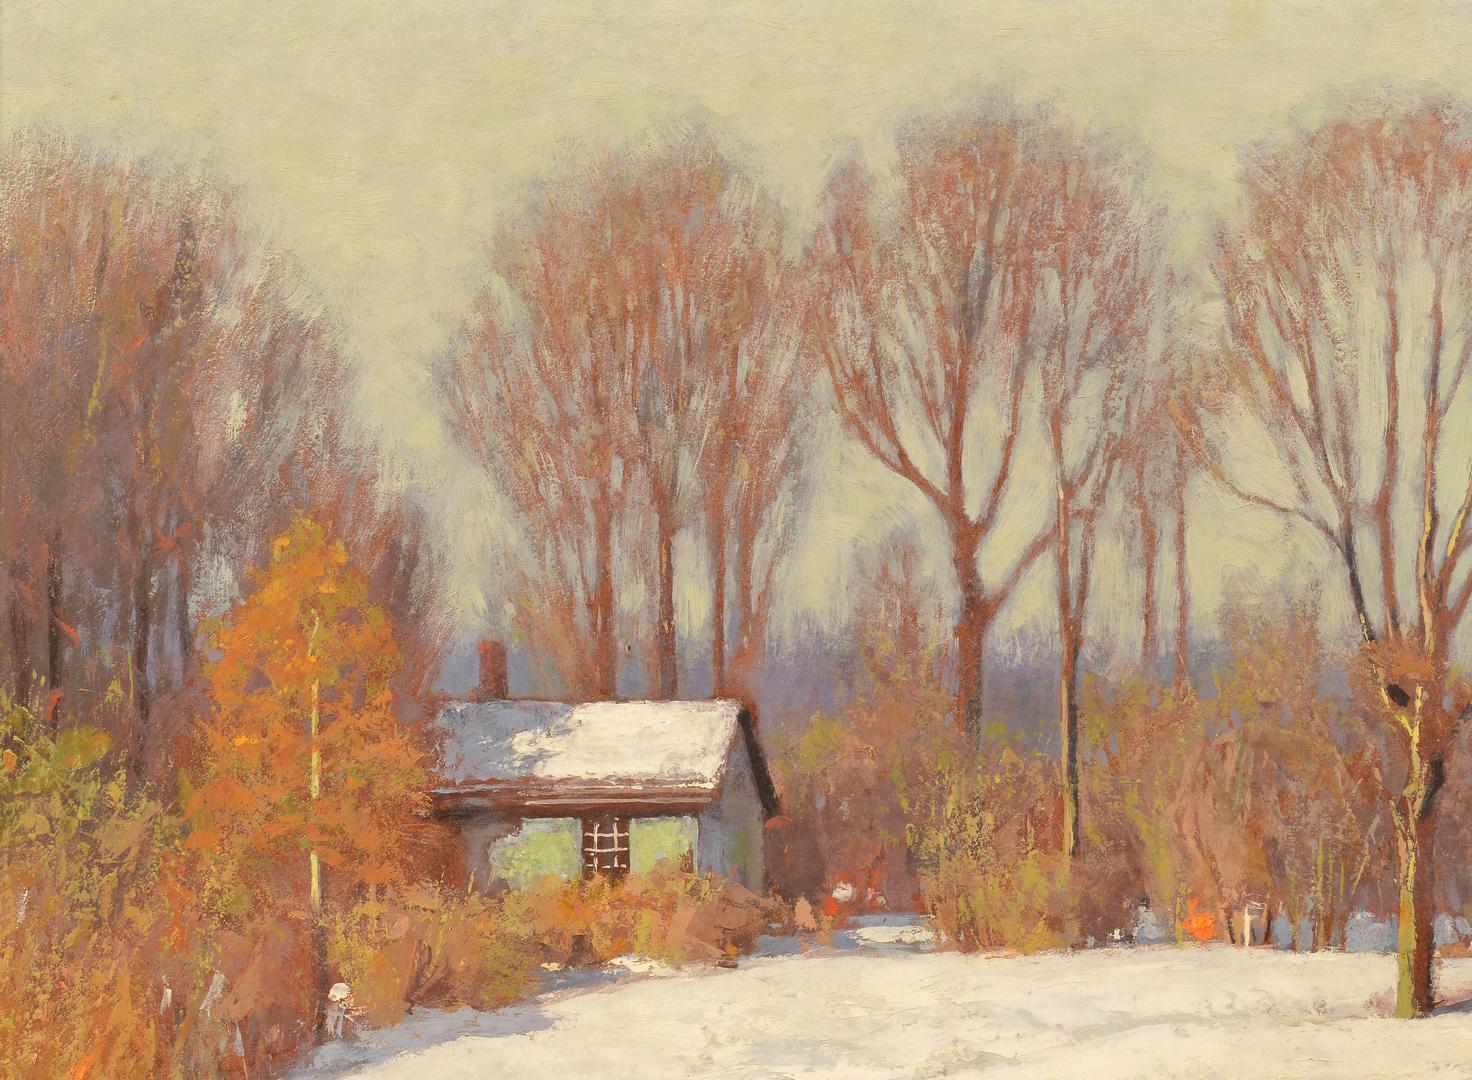 Lot 204 Clifton Wheeler O B Landscape First Snow